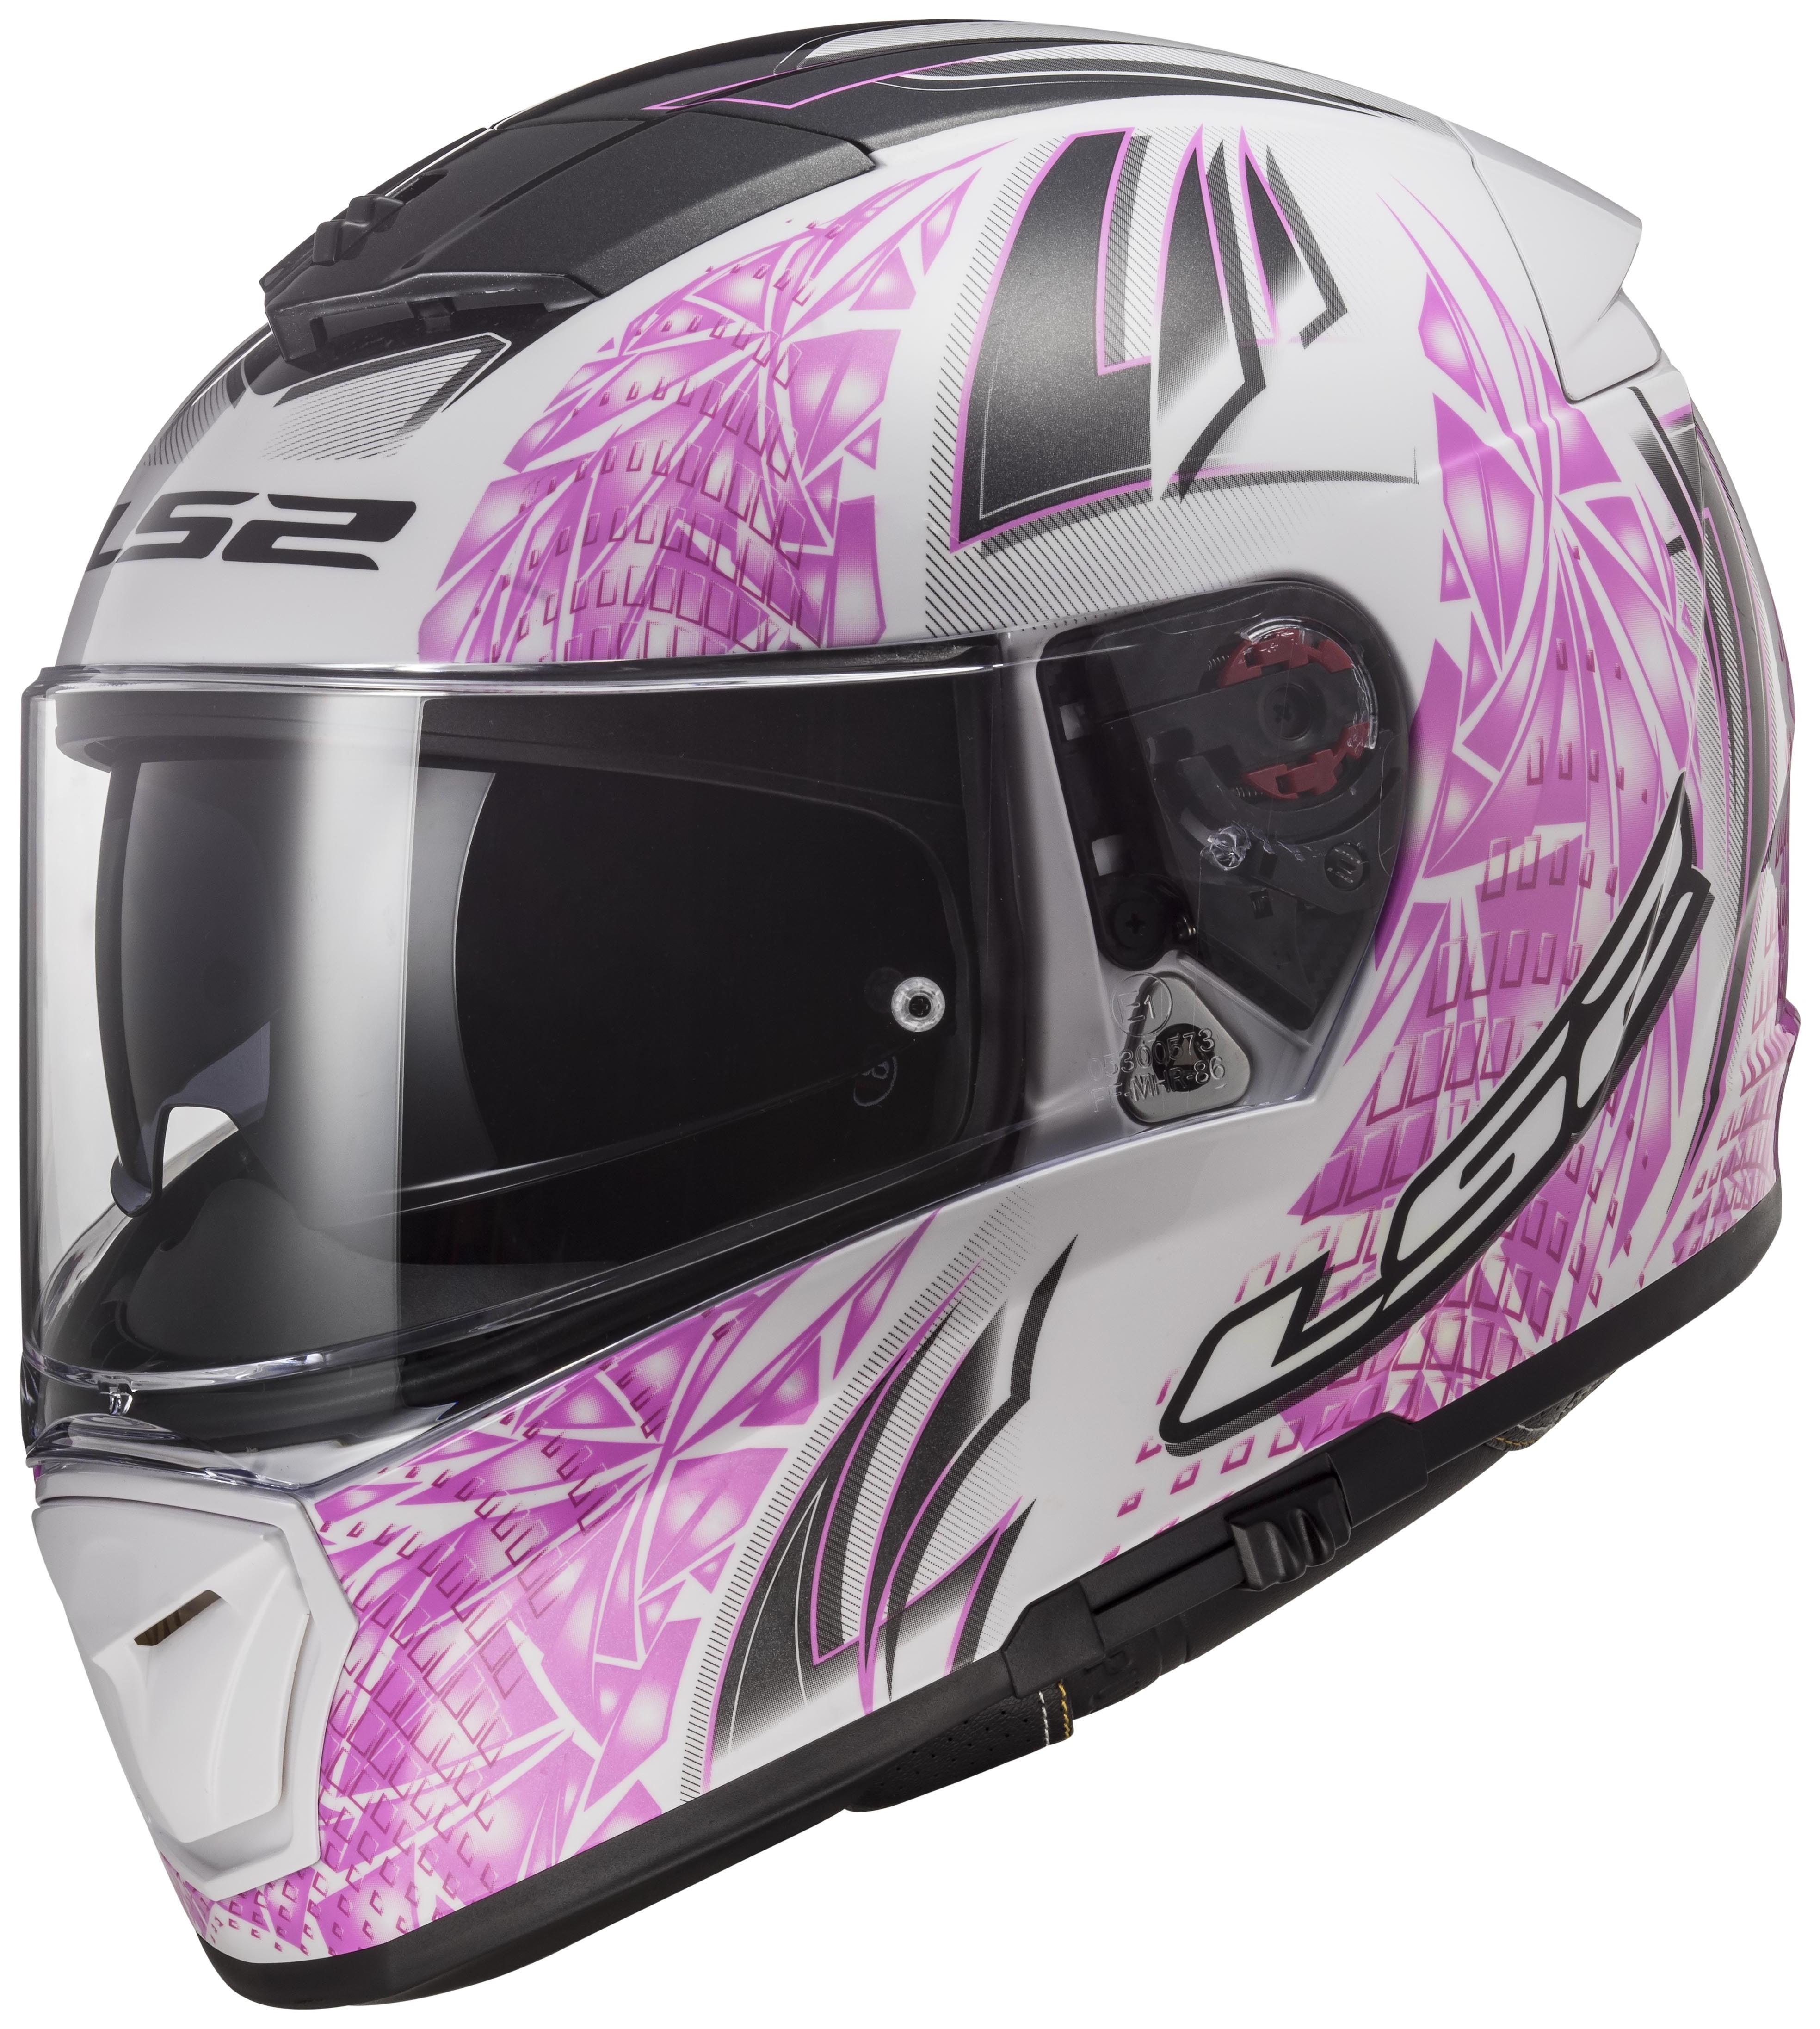 902c4f79 LS2 Breaker Galaxy Helmet - Cycle Gear